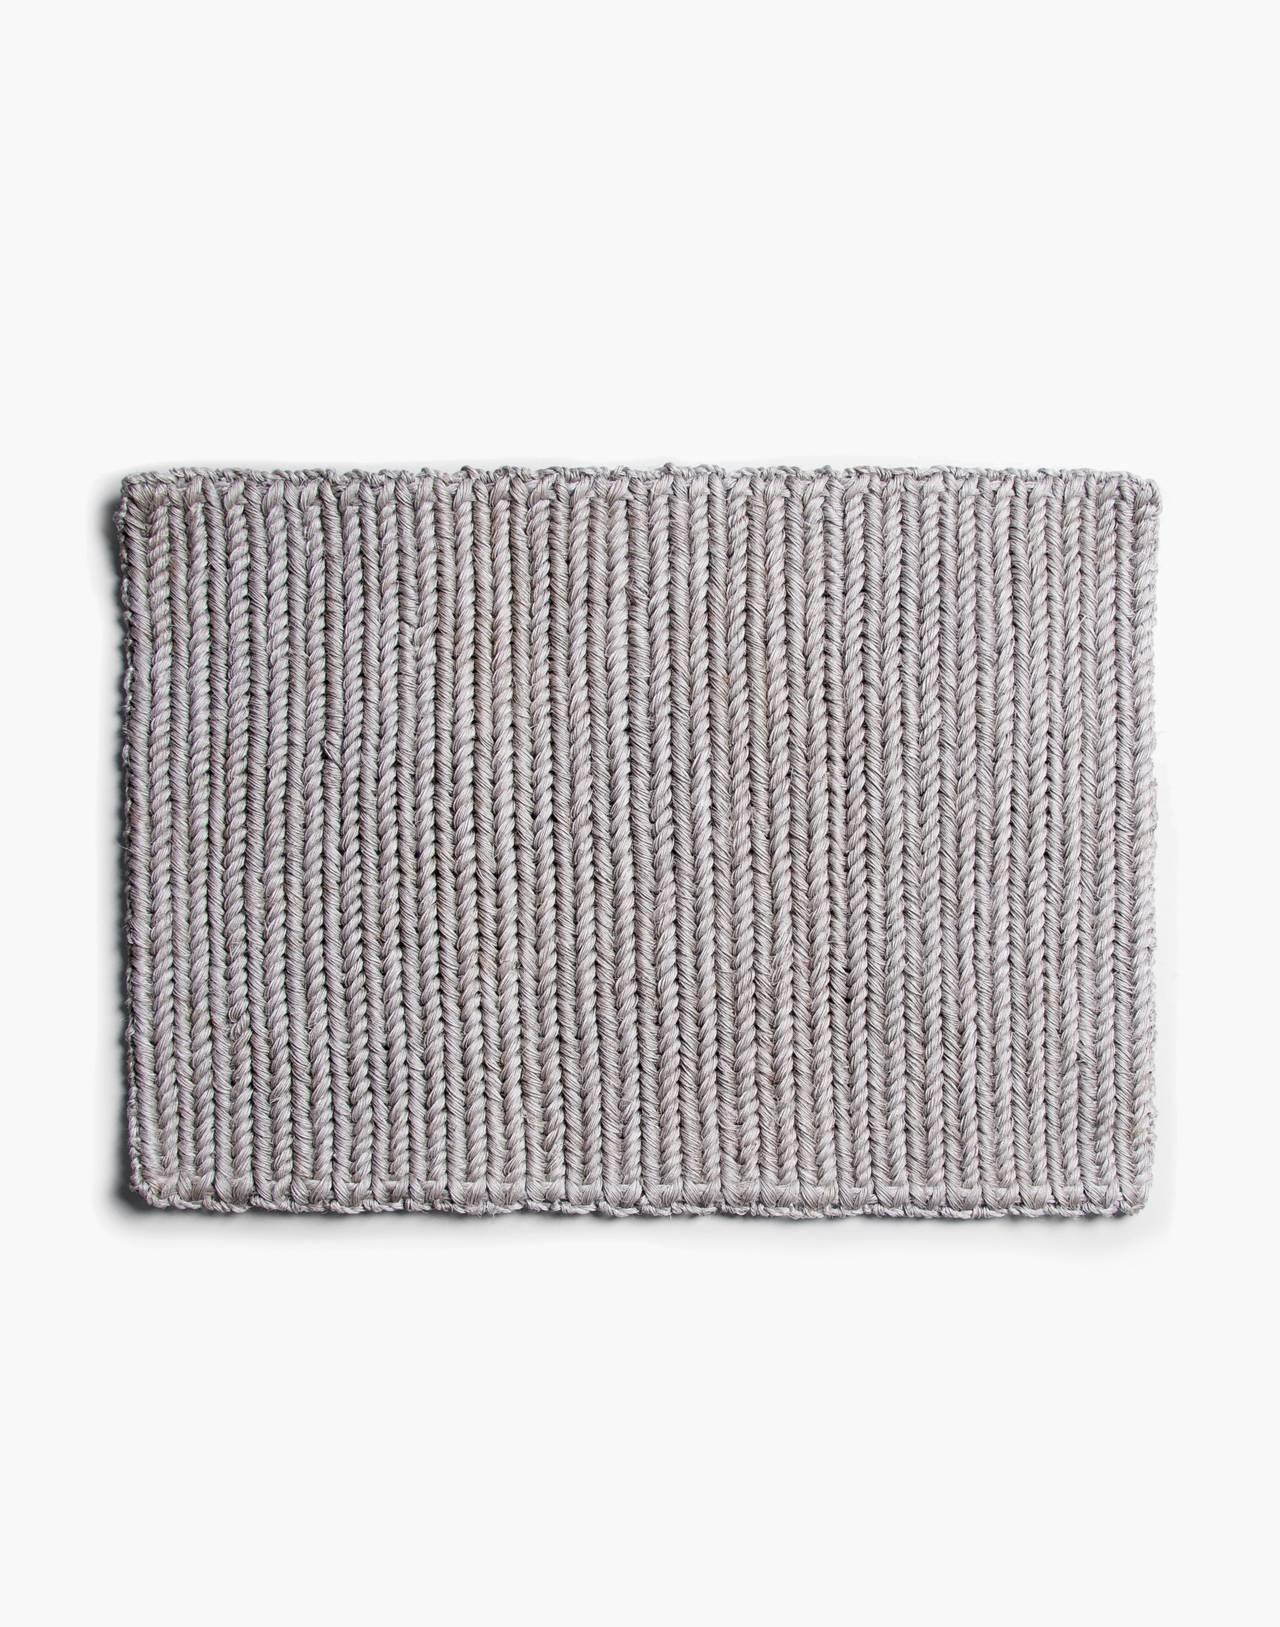 SOMEWARE™ Braided Doormat in grey image 2